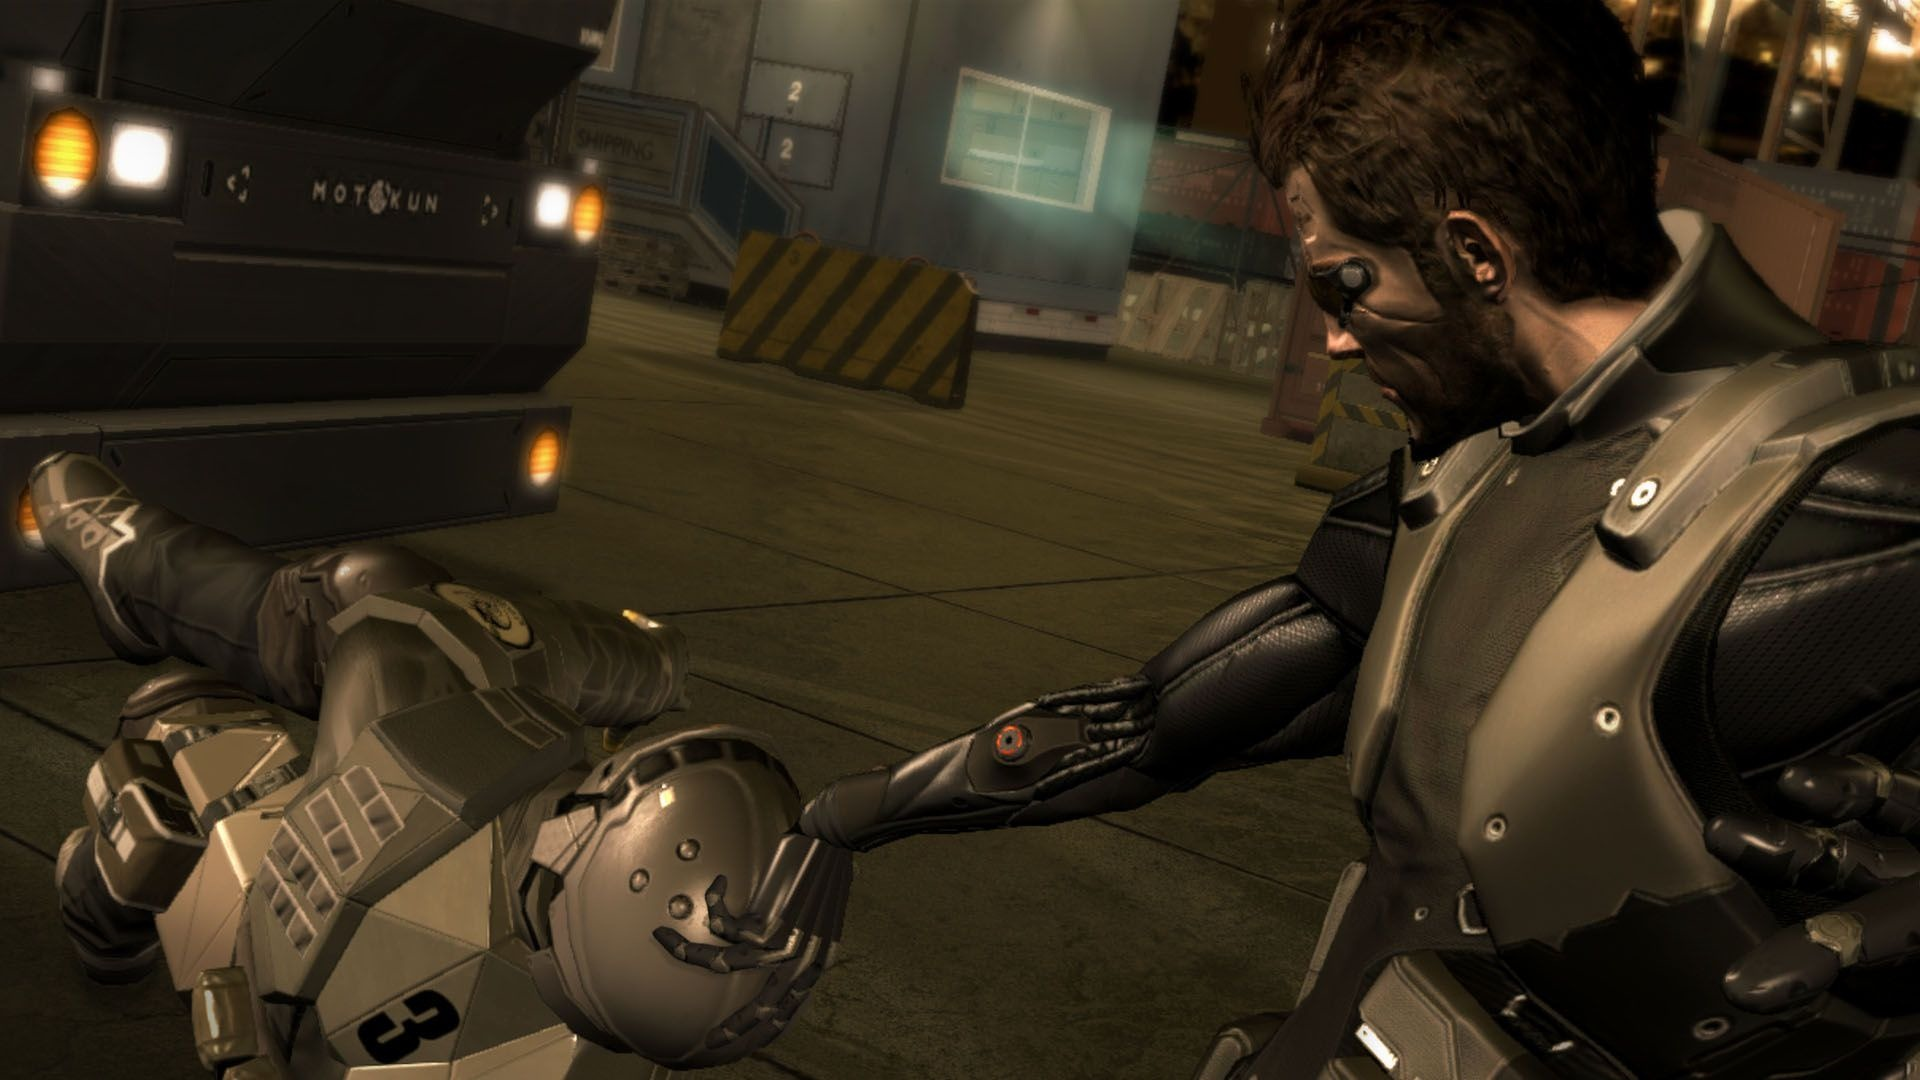 http://onyxgame.com/img/game/deus-ex-human-revolution/screenshots/deus-ex-human-revolution-image-screenshot-3.jpg